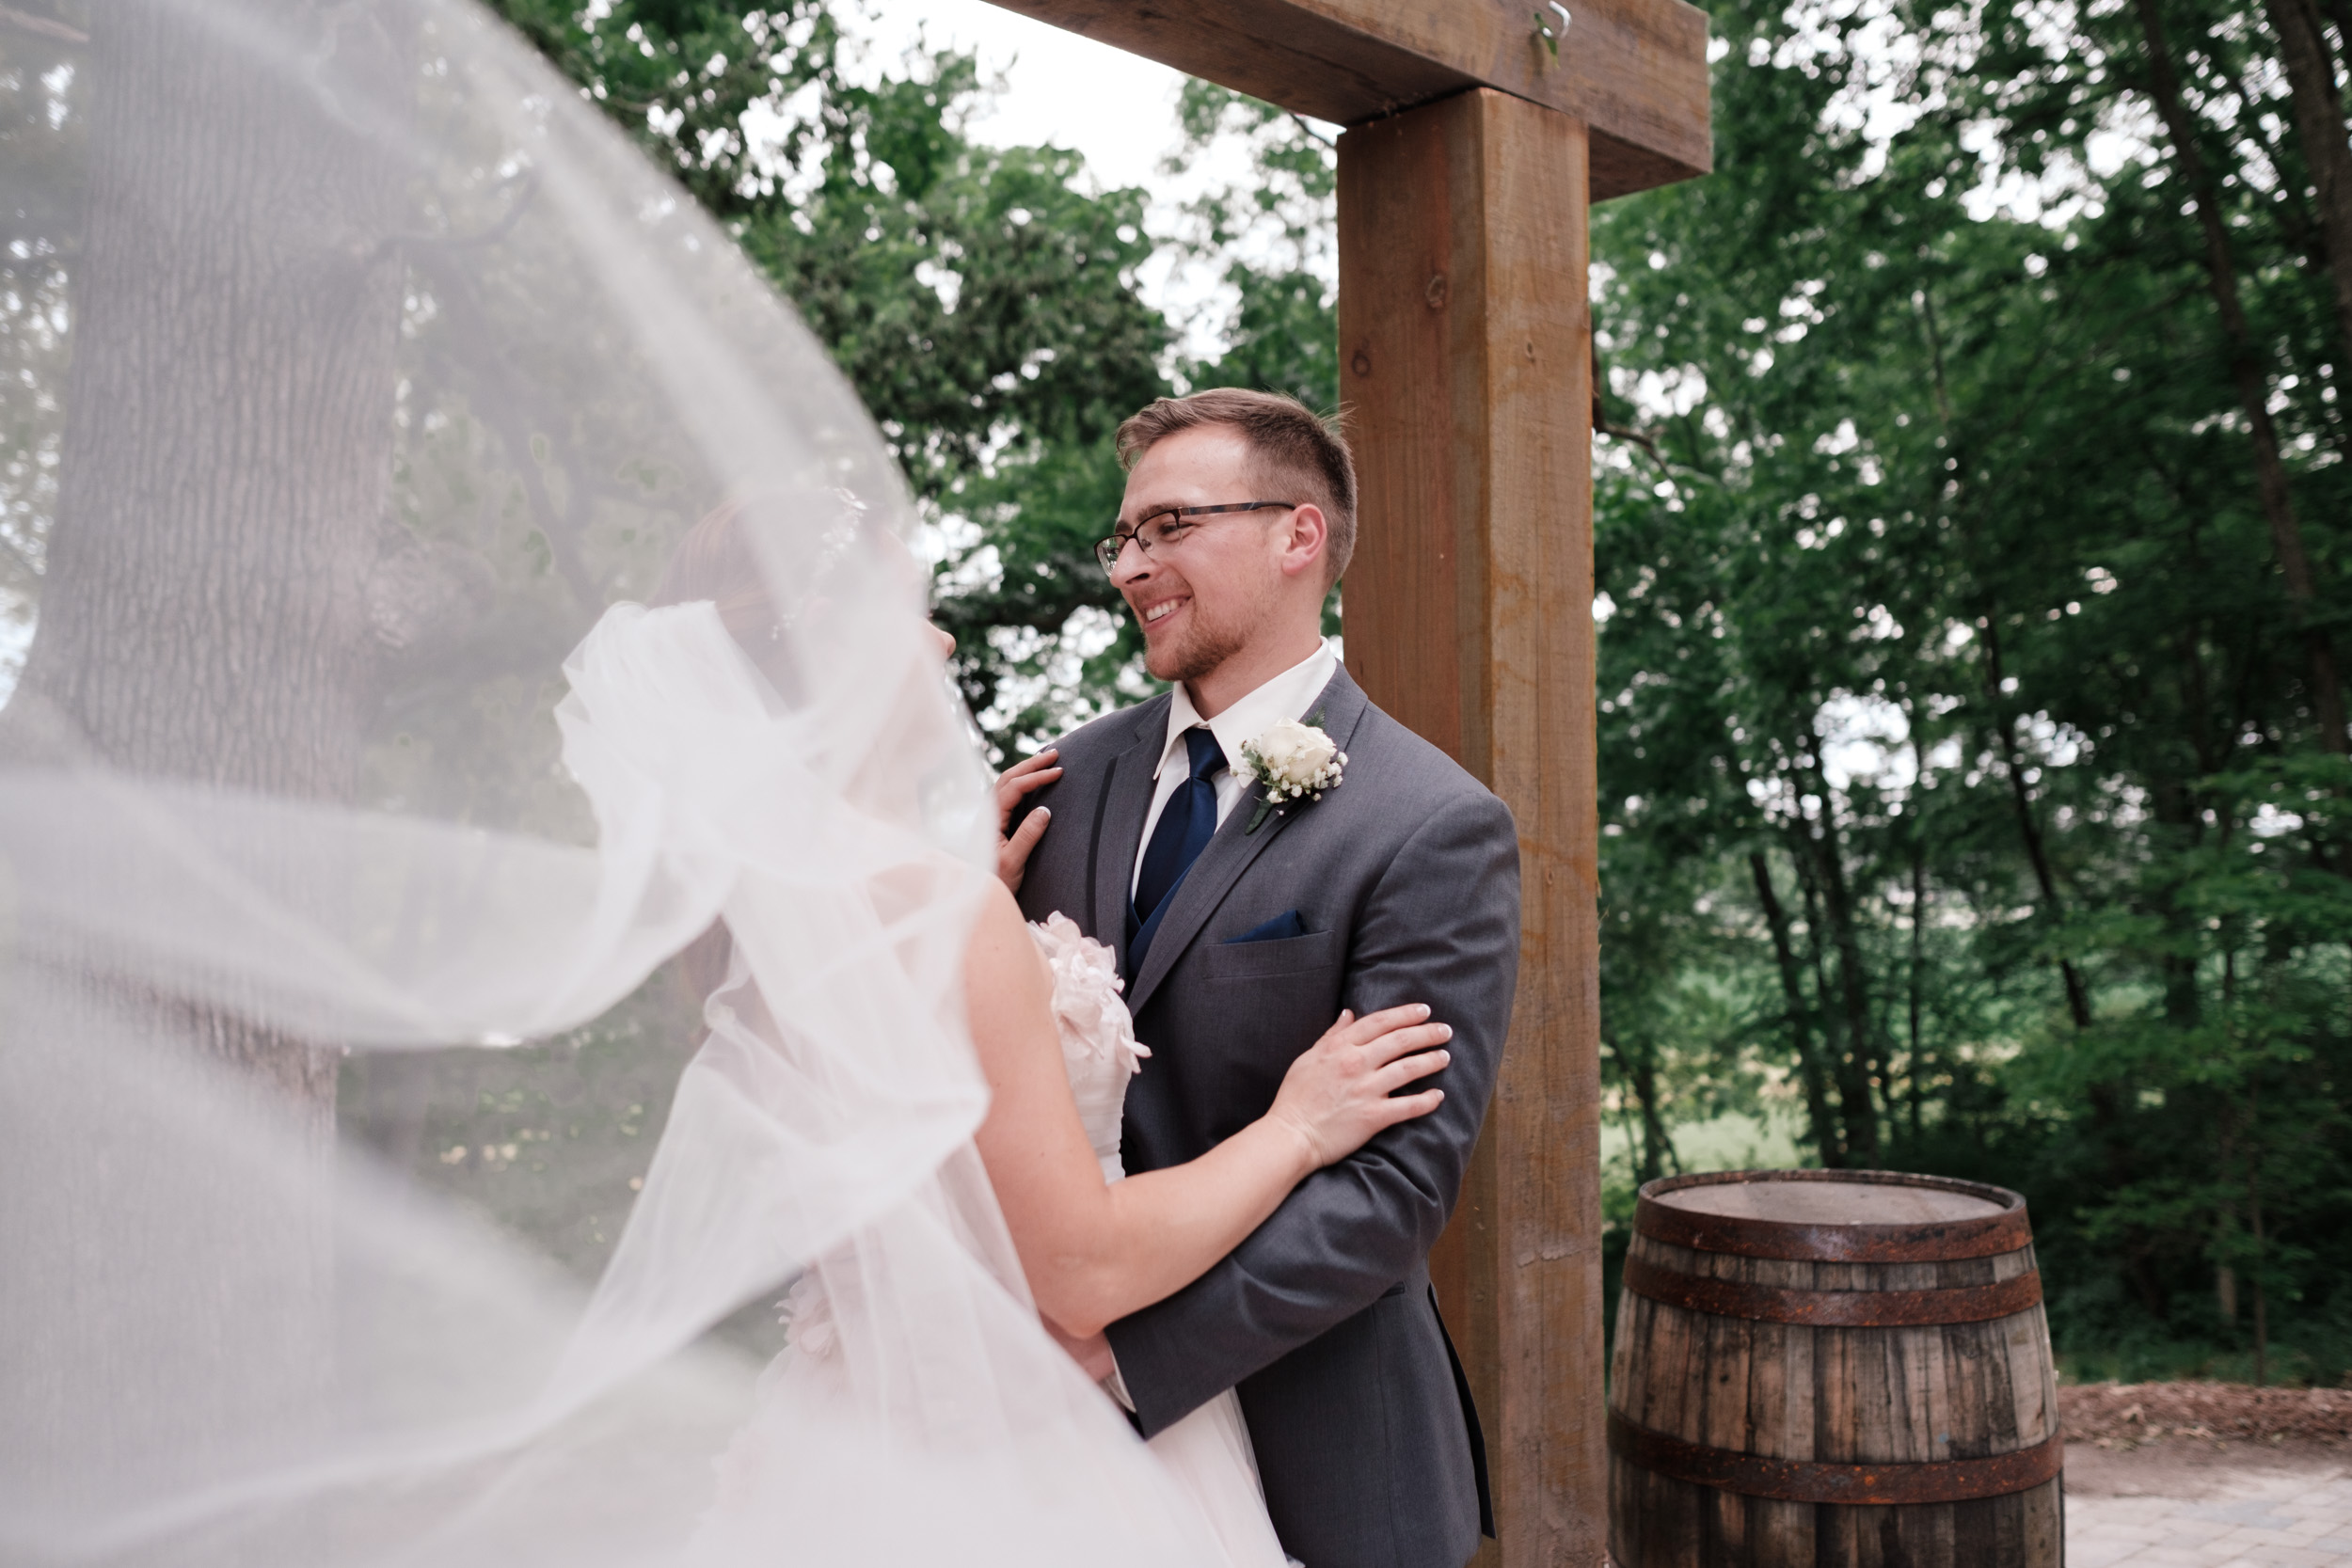 19-06-22-Ryan-Katie-The-Fields-Reserve-Wedding-40.jpg